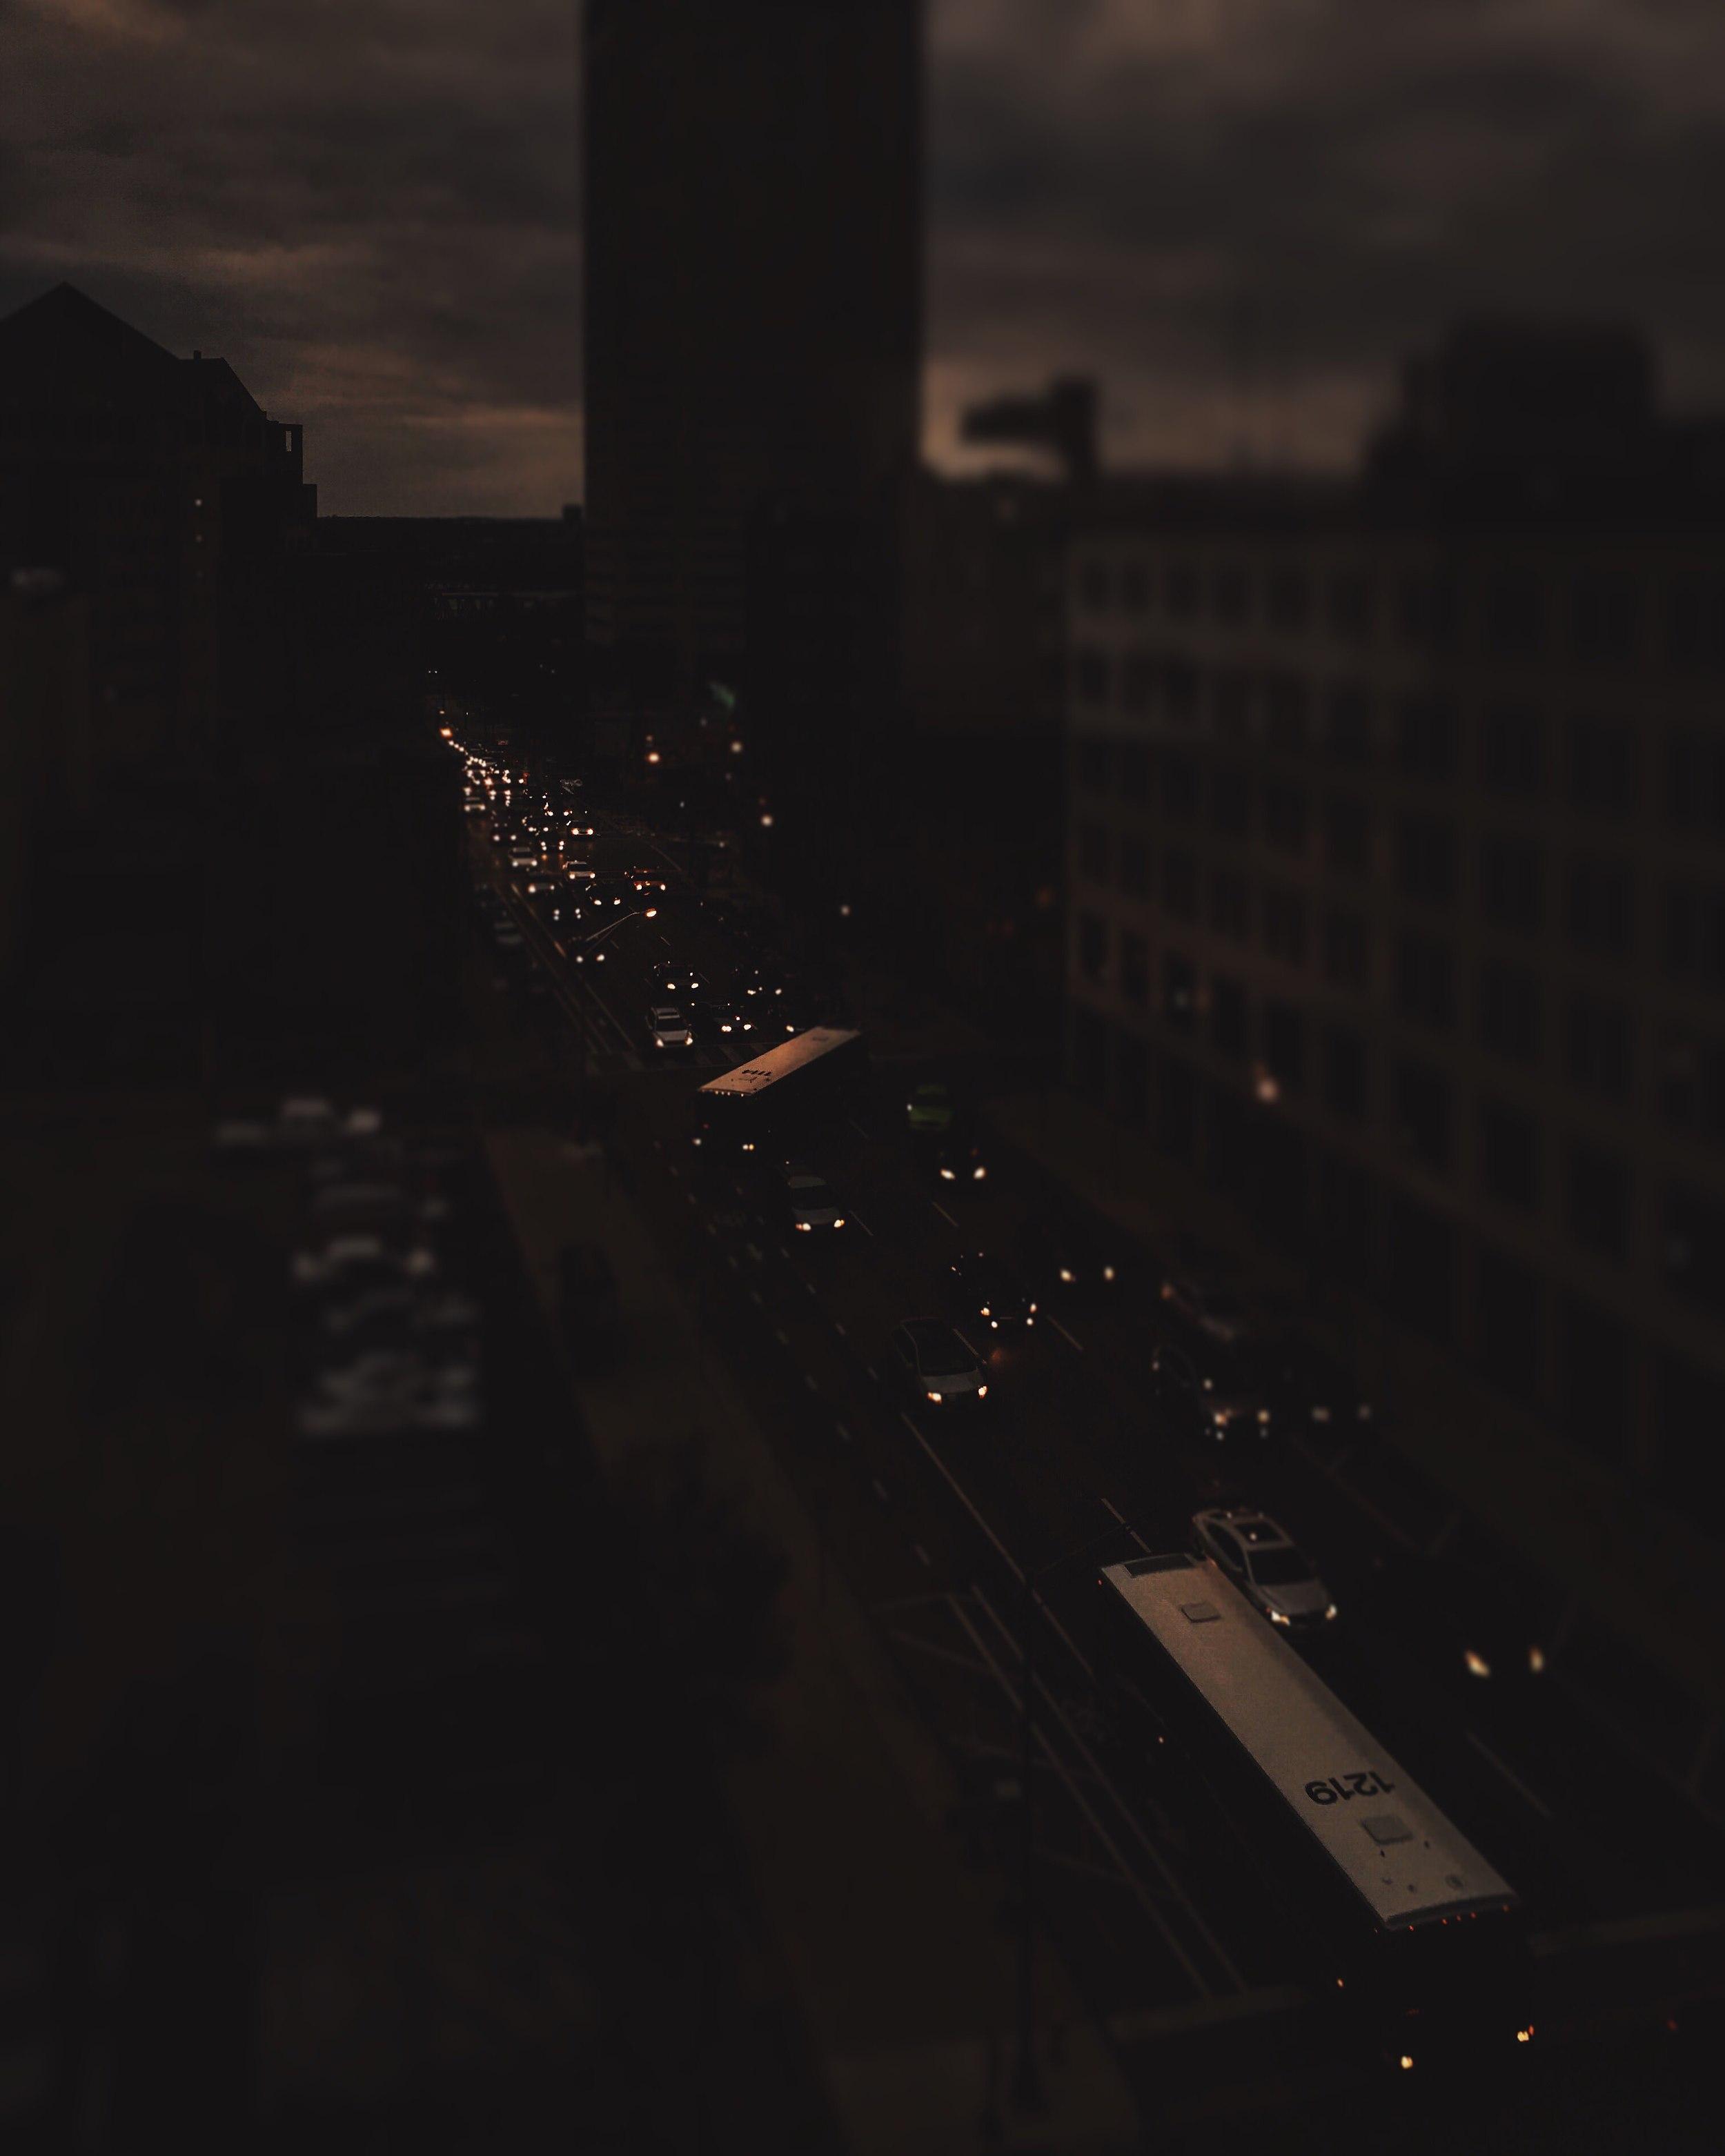 Cbus_City.jpg